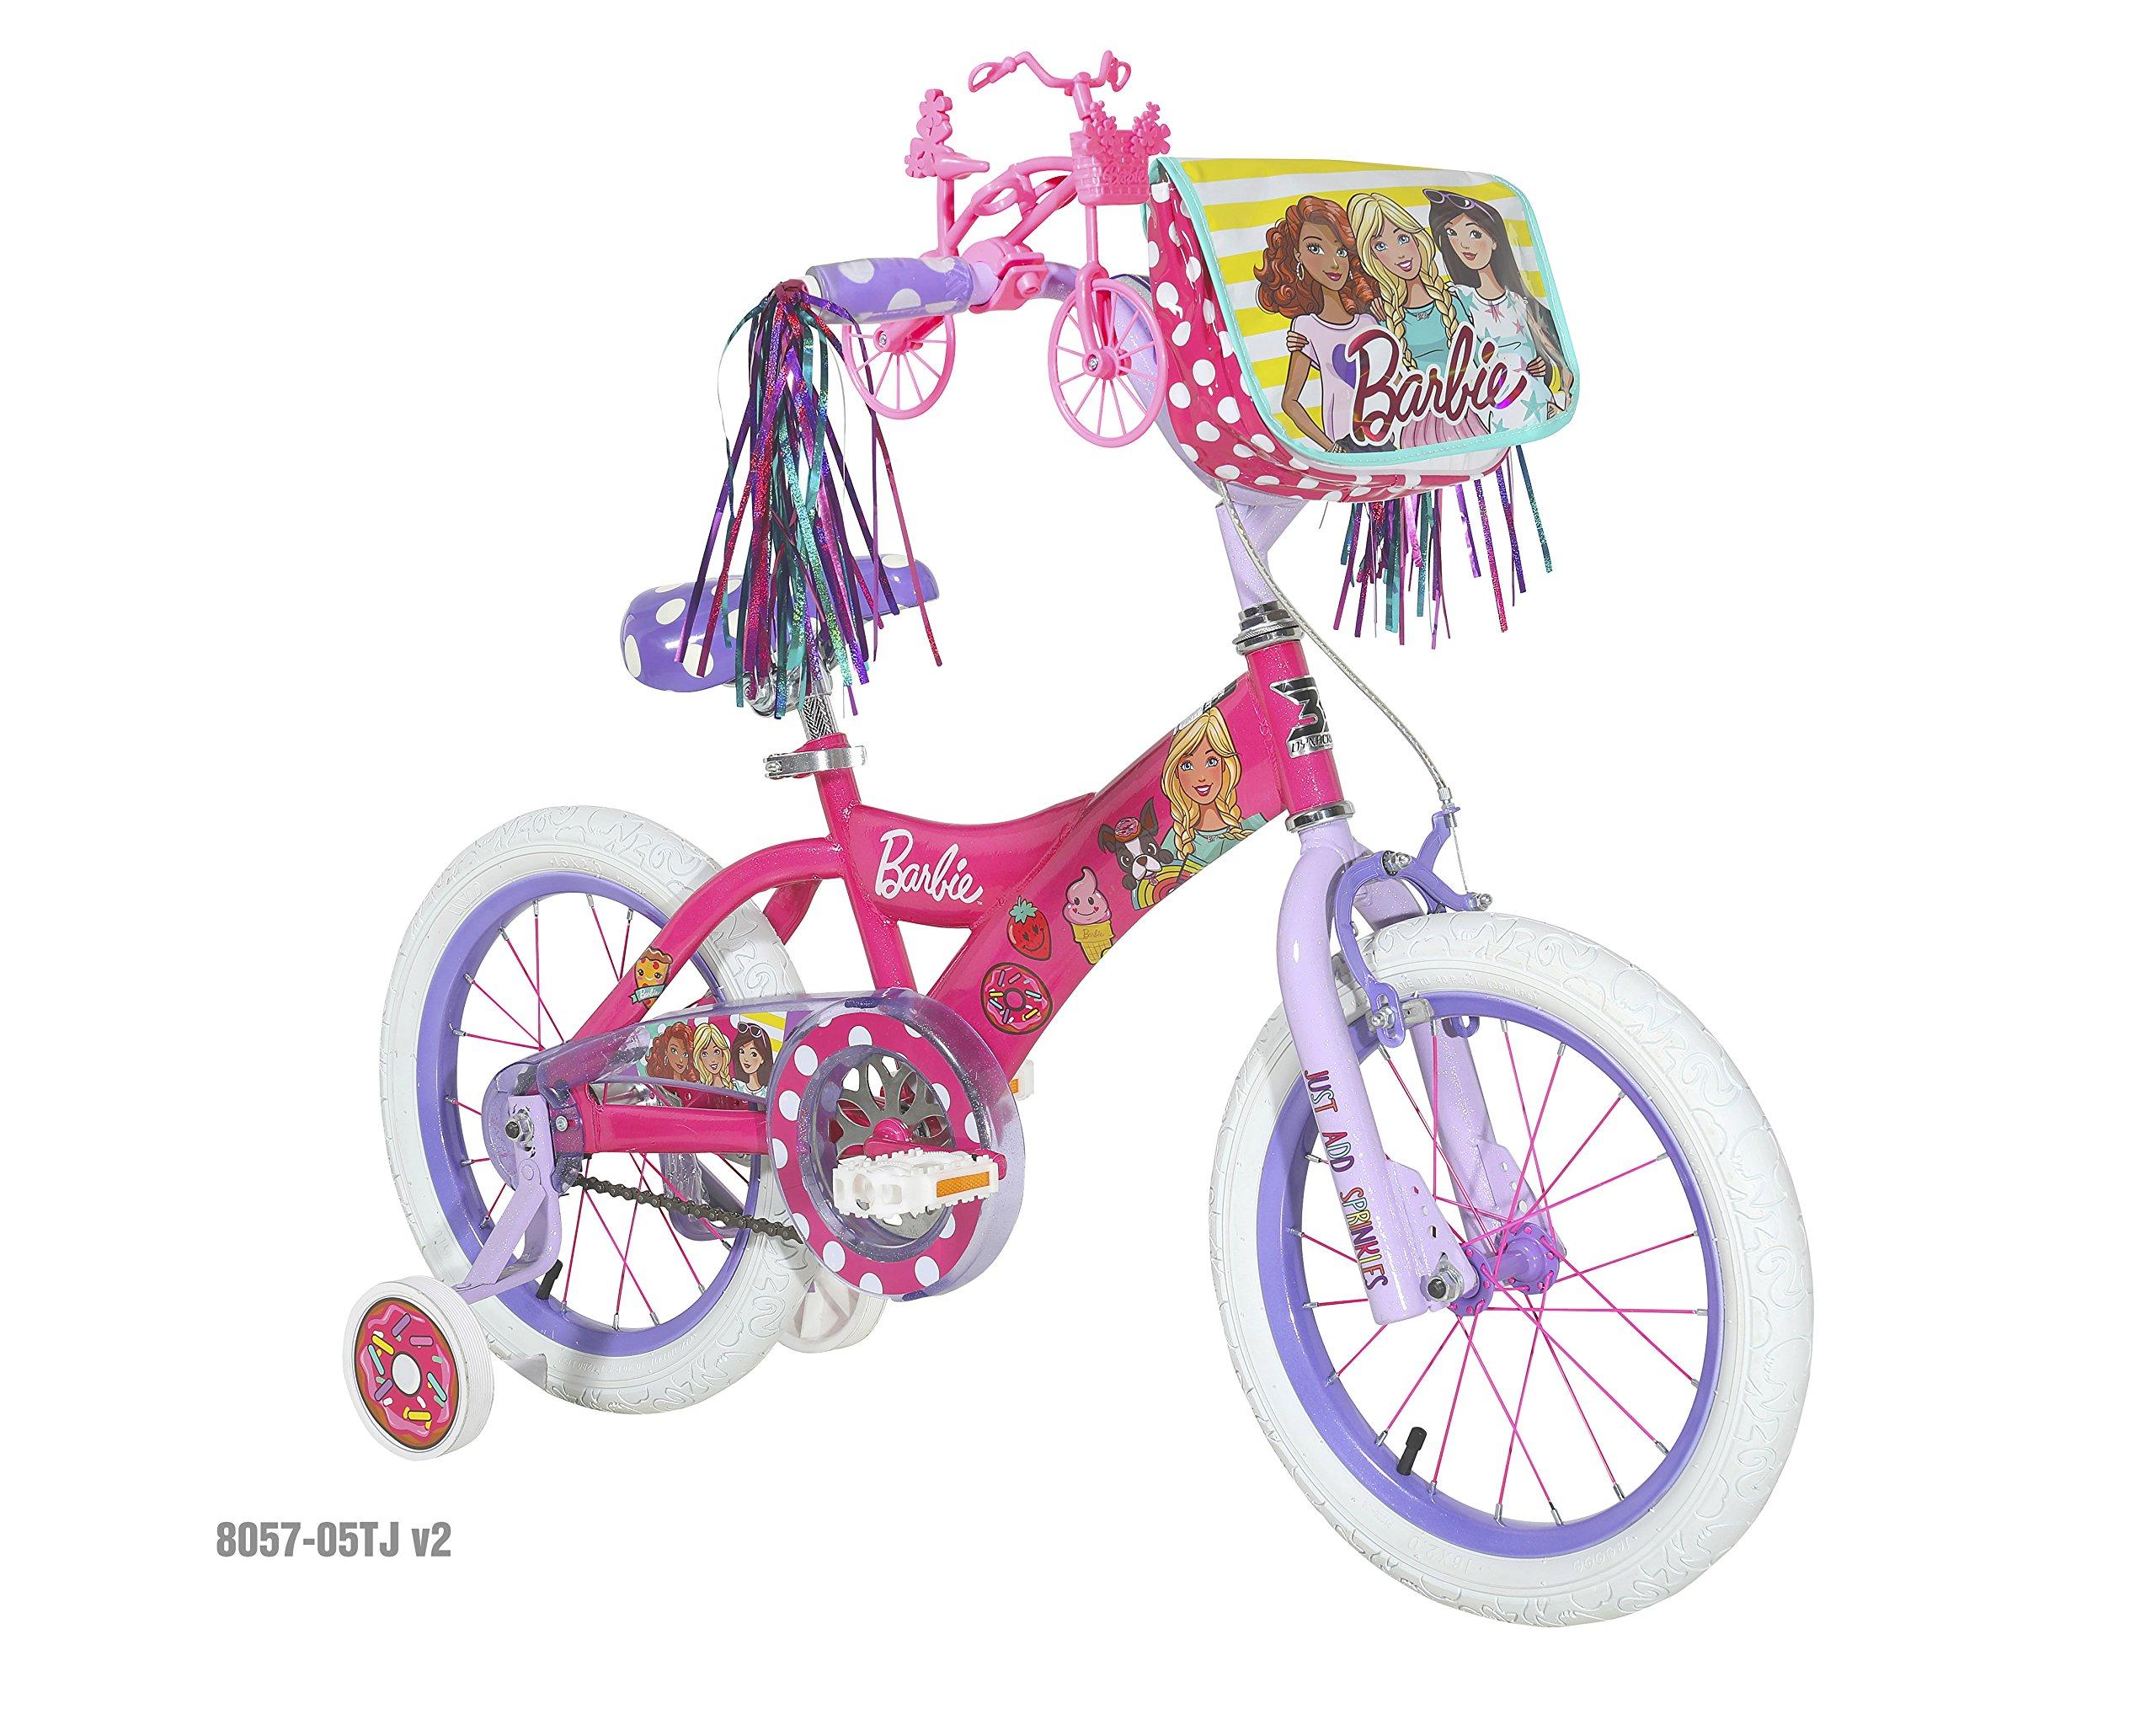 Barbie Dynacraft Girls BMX Street Bike 16'', Pink/White/Purple